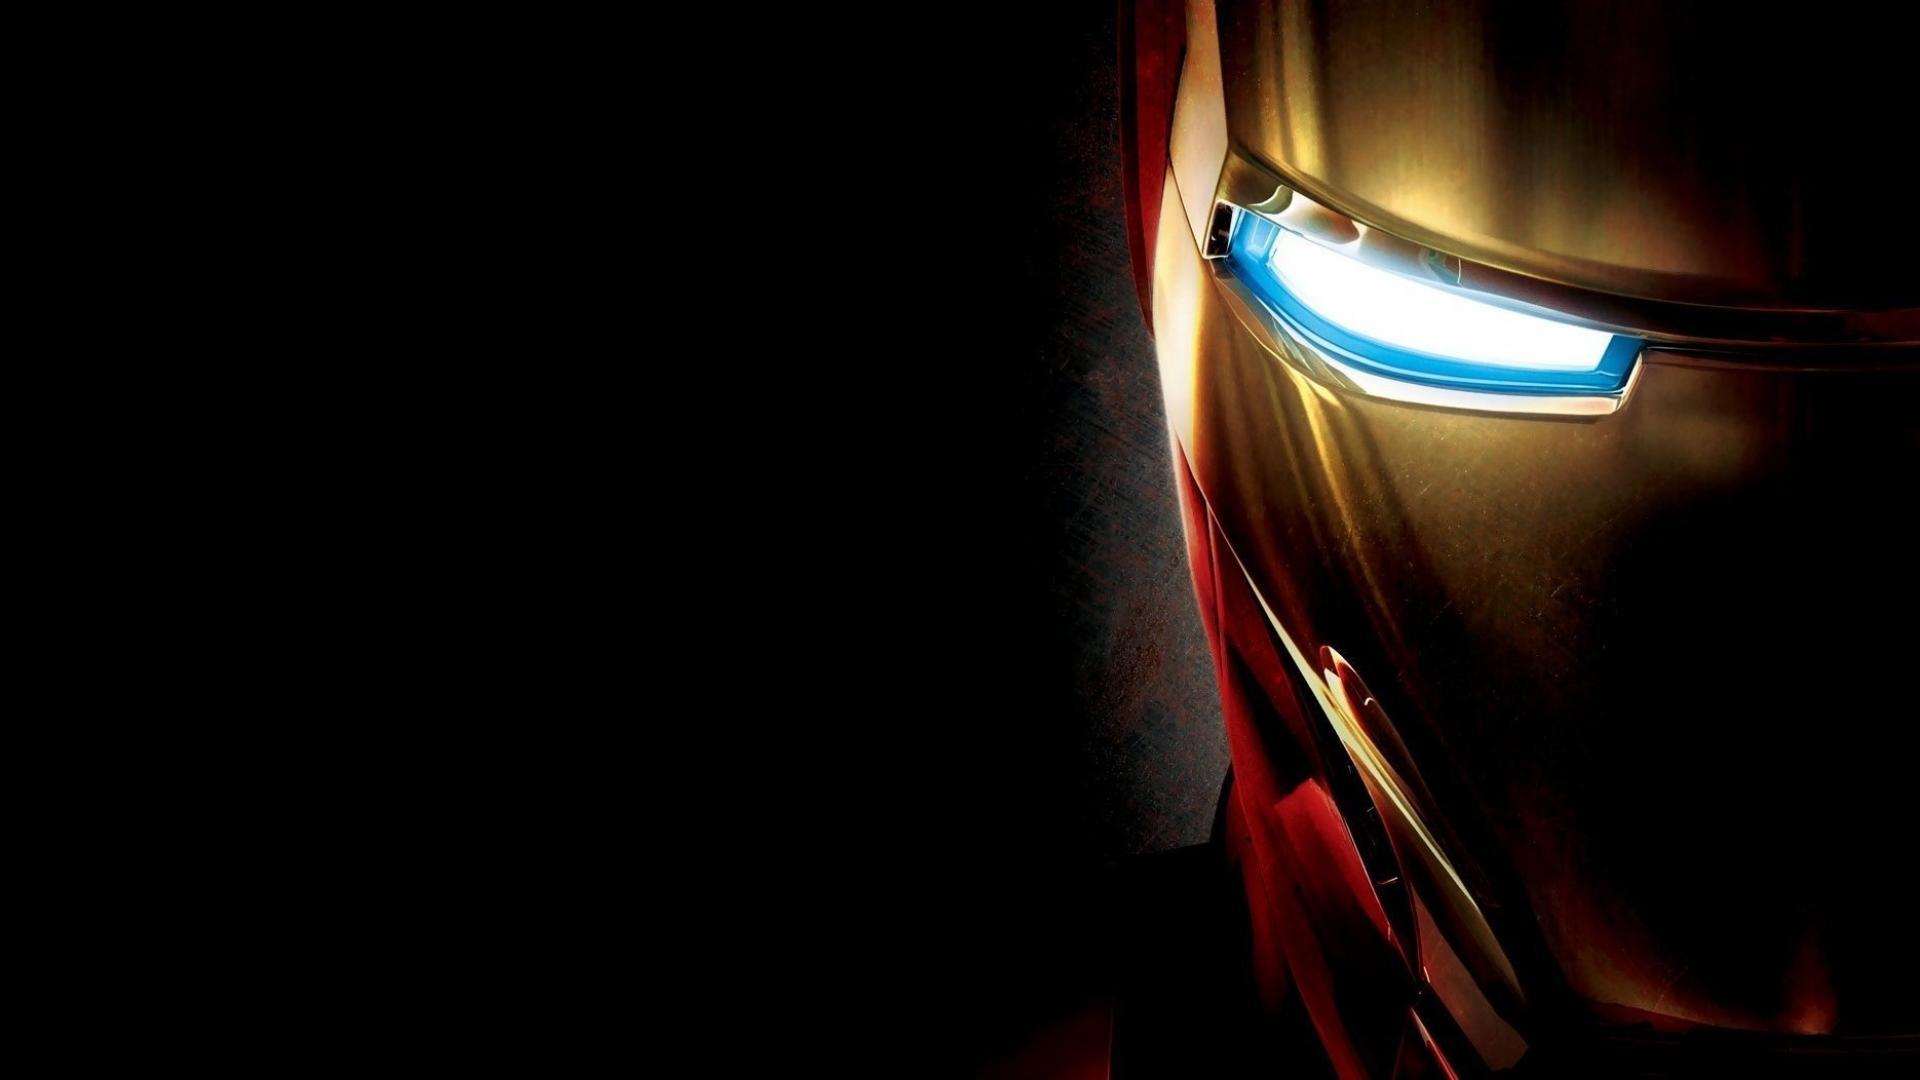 Iron Man simple Face Full HD Desktop Wallpapers 1080p 1920x1080